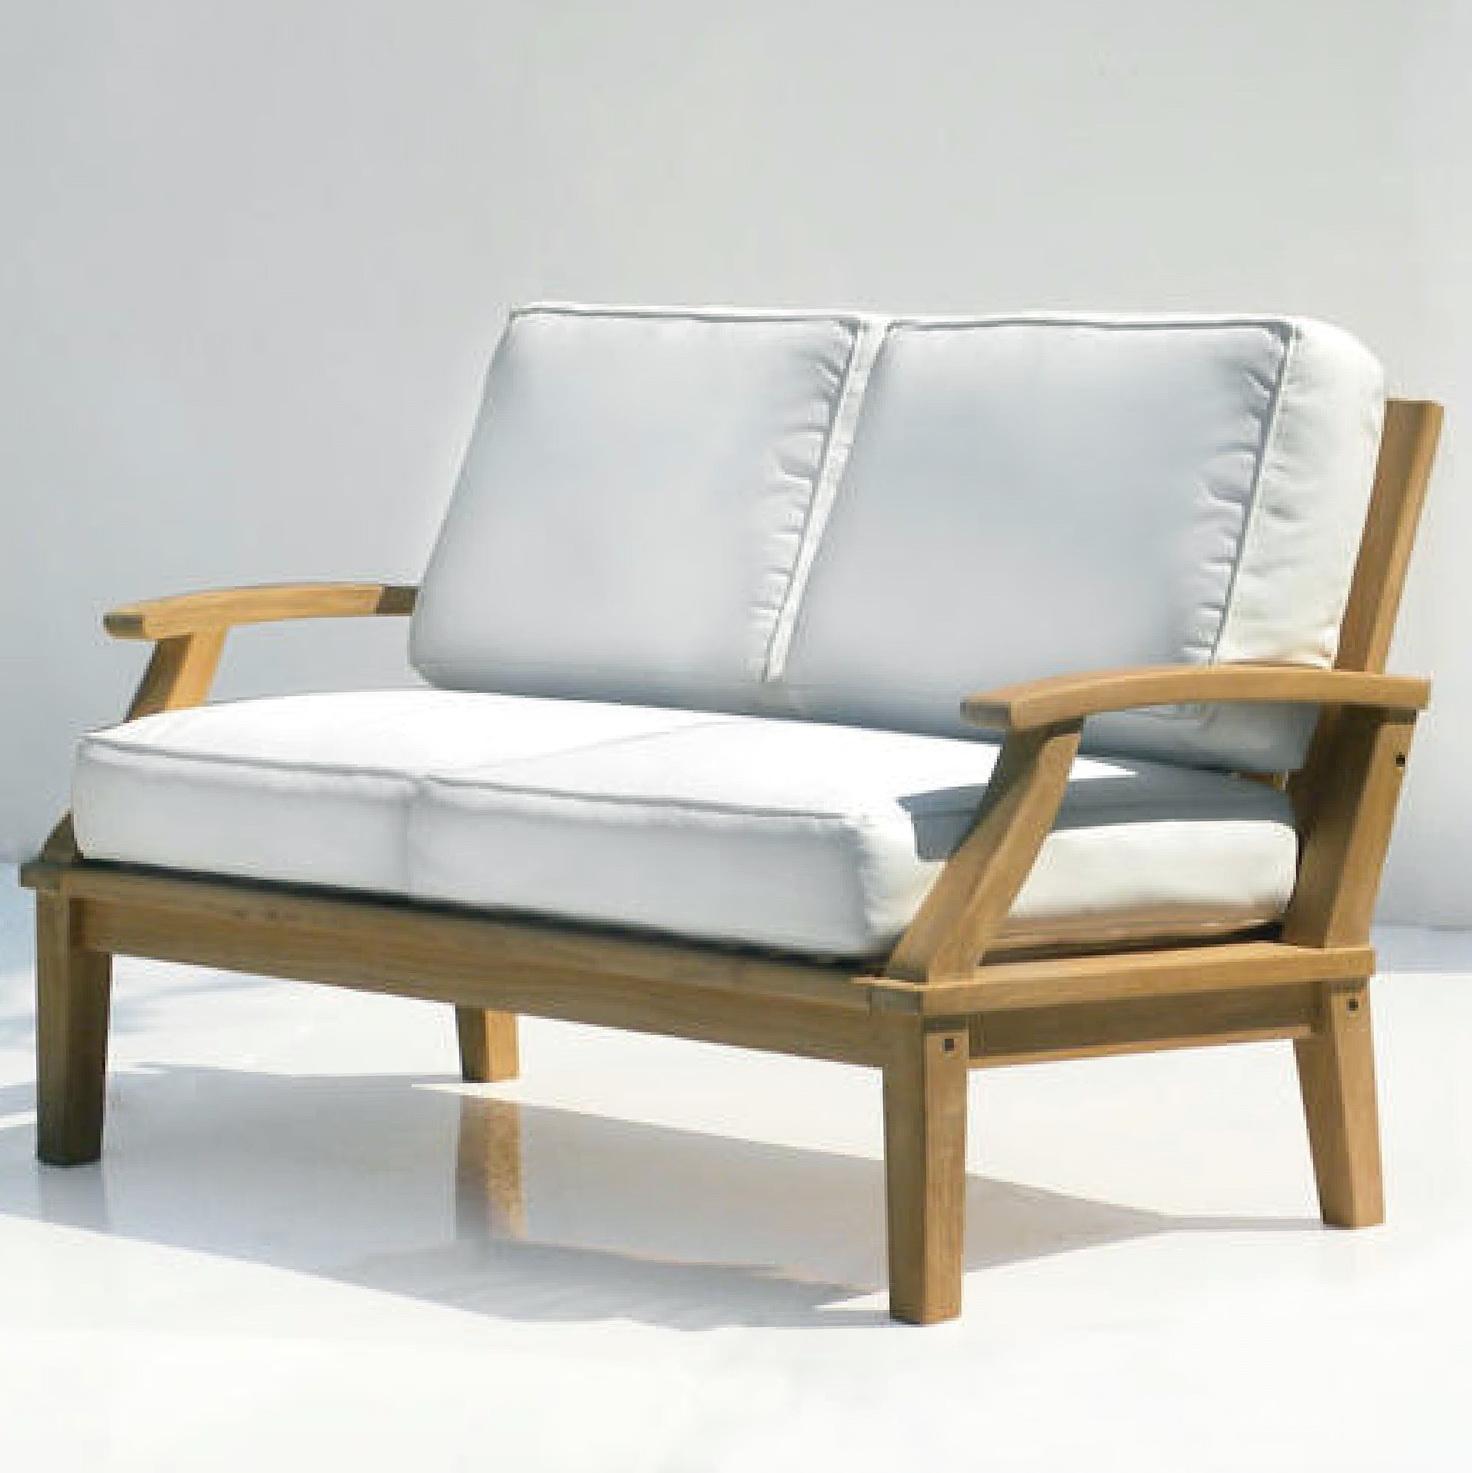 Deep Seat Cushions Home Depot Home Design Ideas